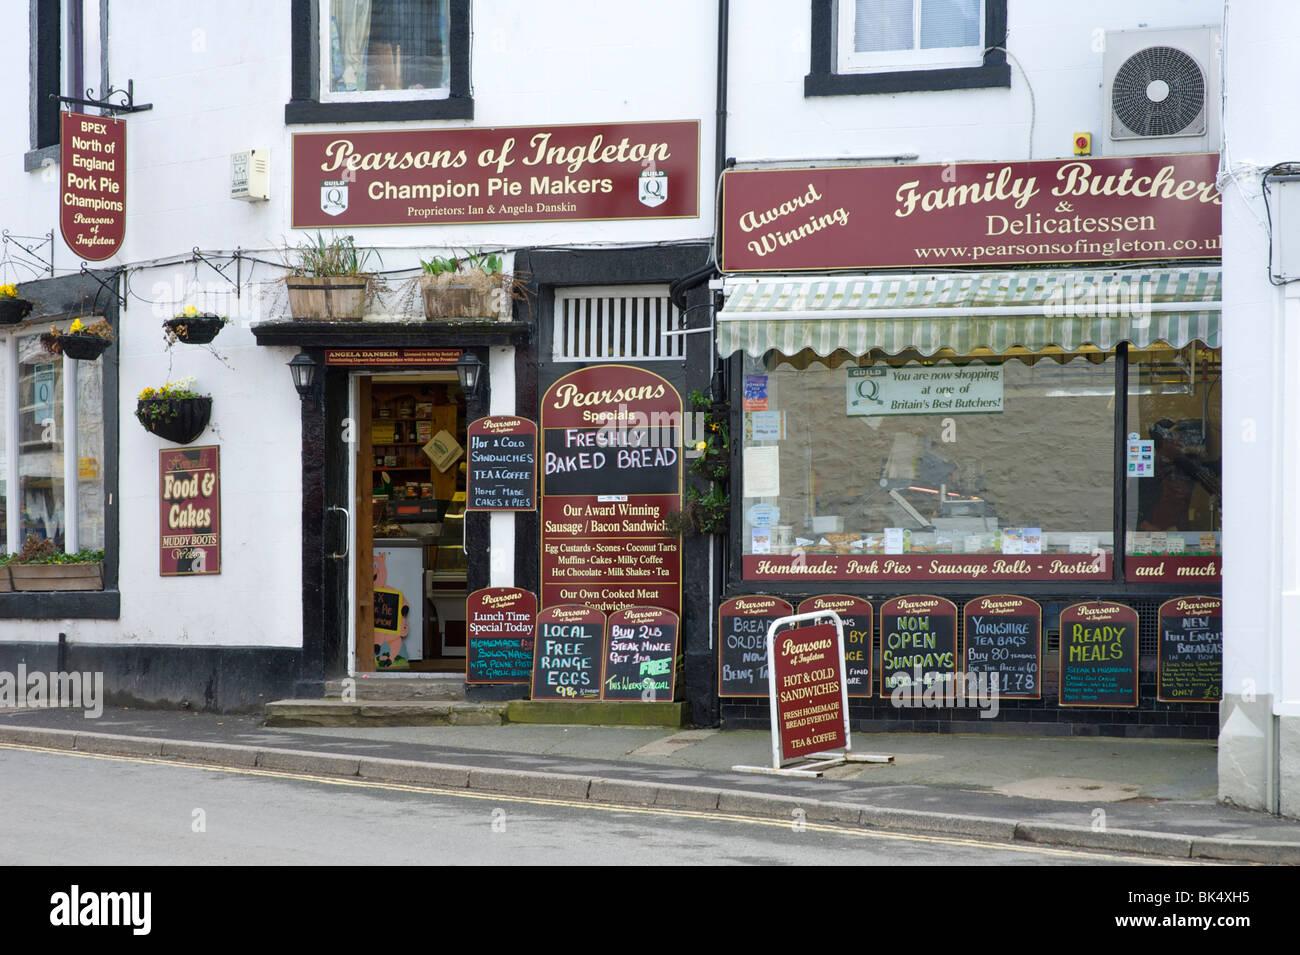 bfe8012846 Pearsons butchers shop, Ingleton, North Yorkshire, England UK - Stock Image